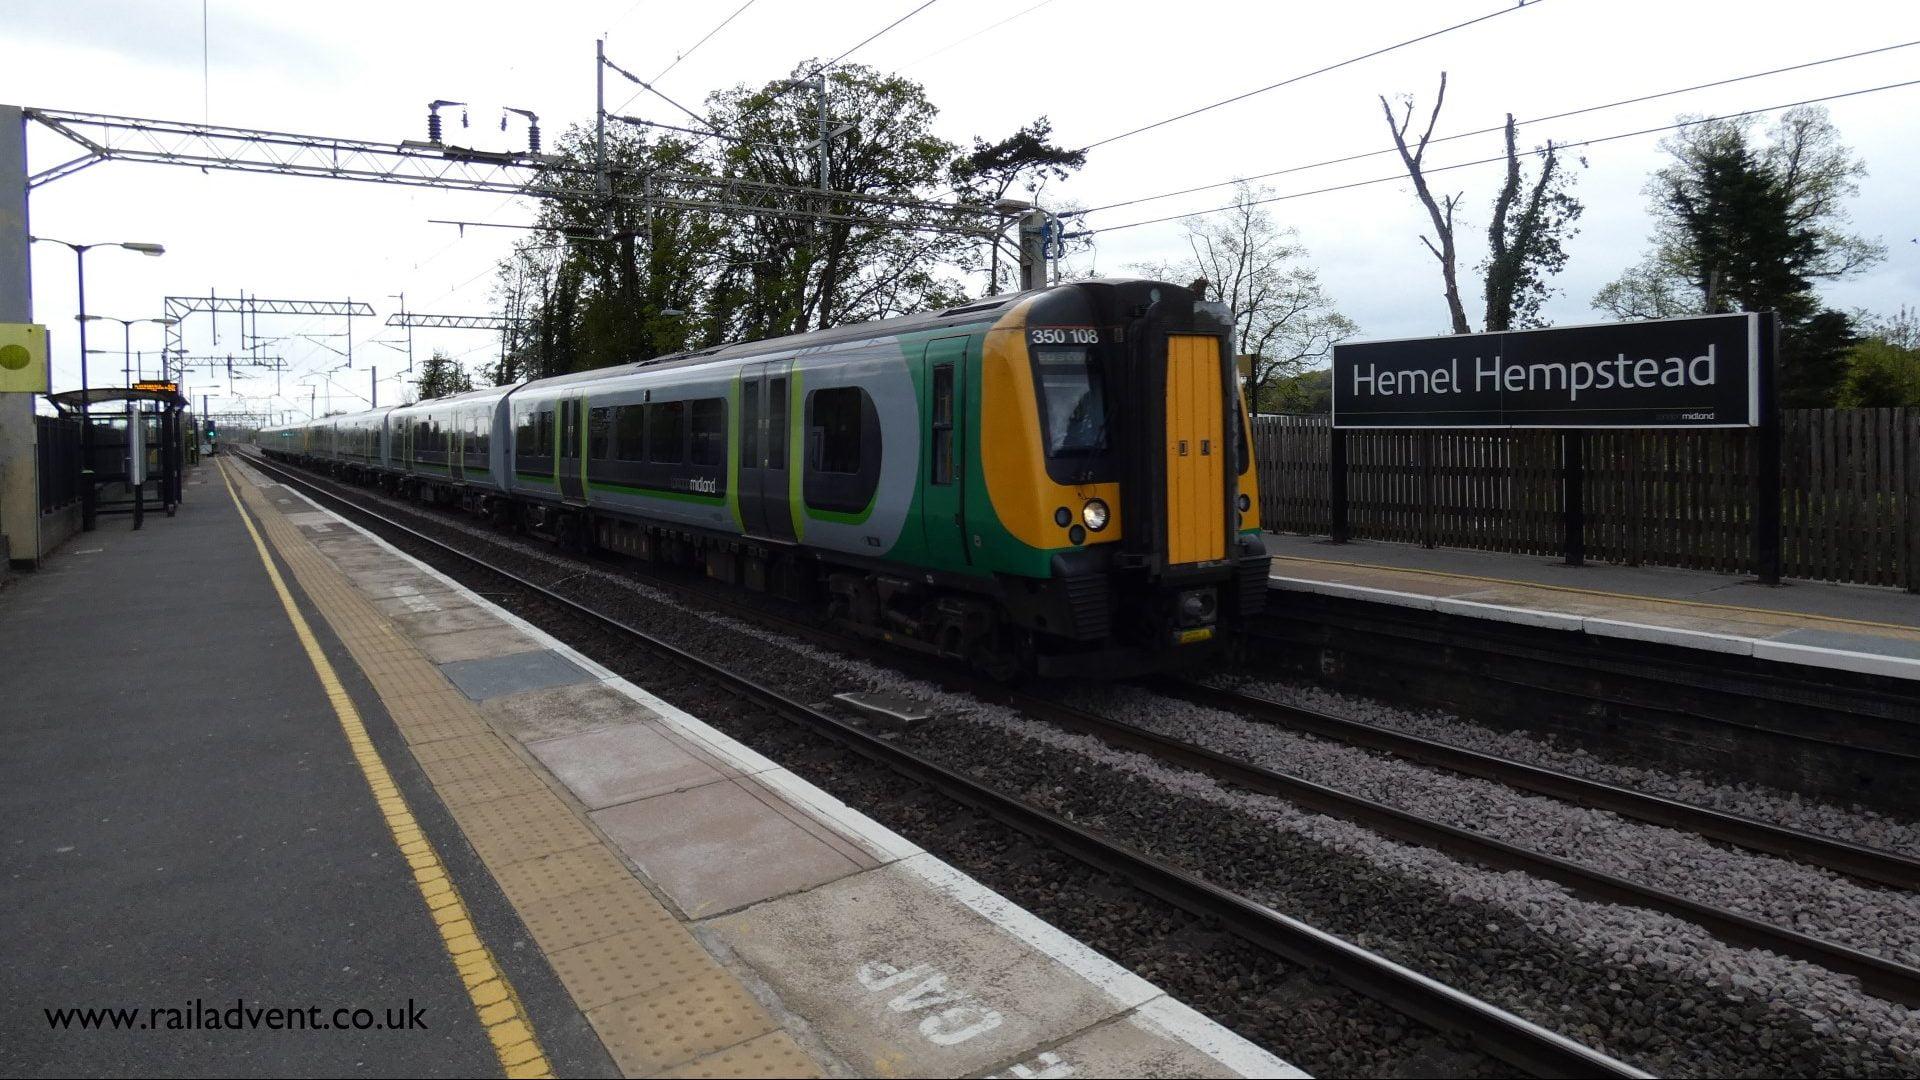 350108 at Hemel Hempstead